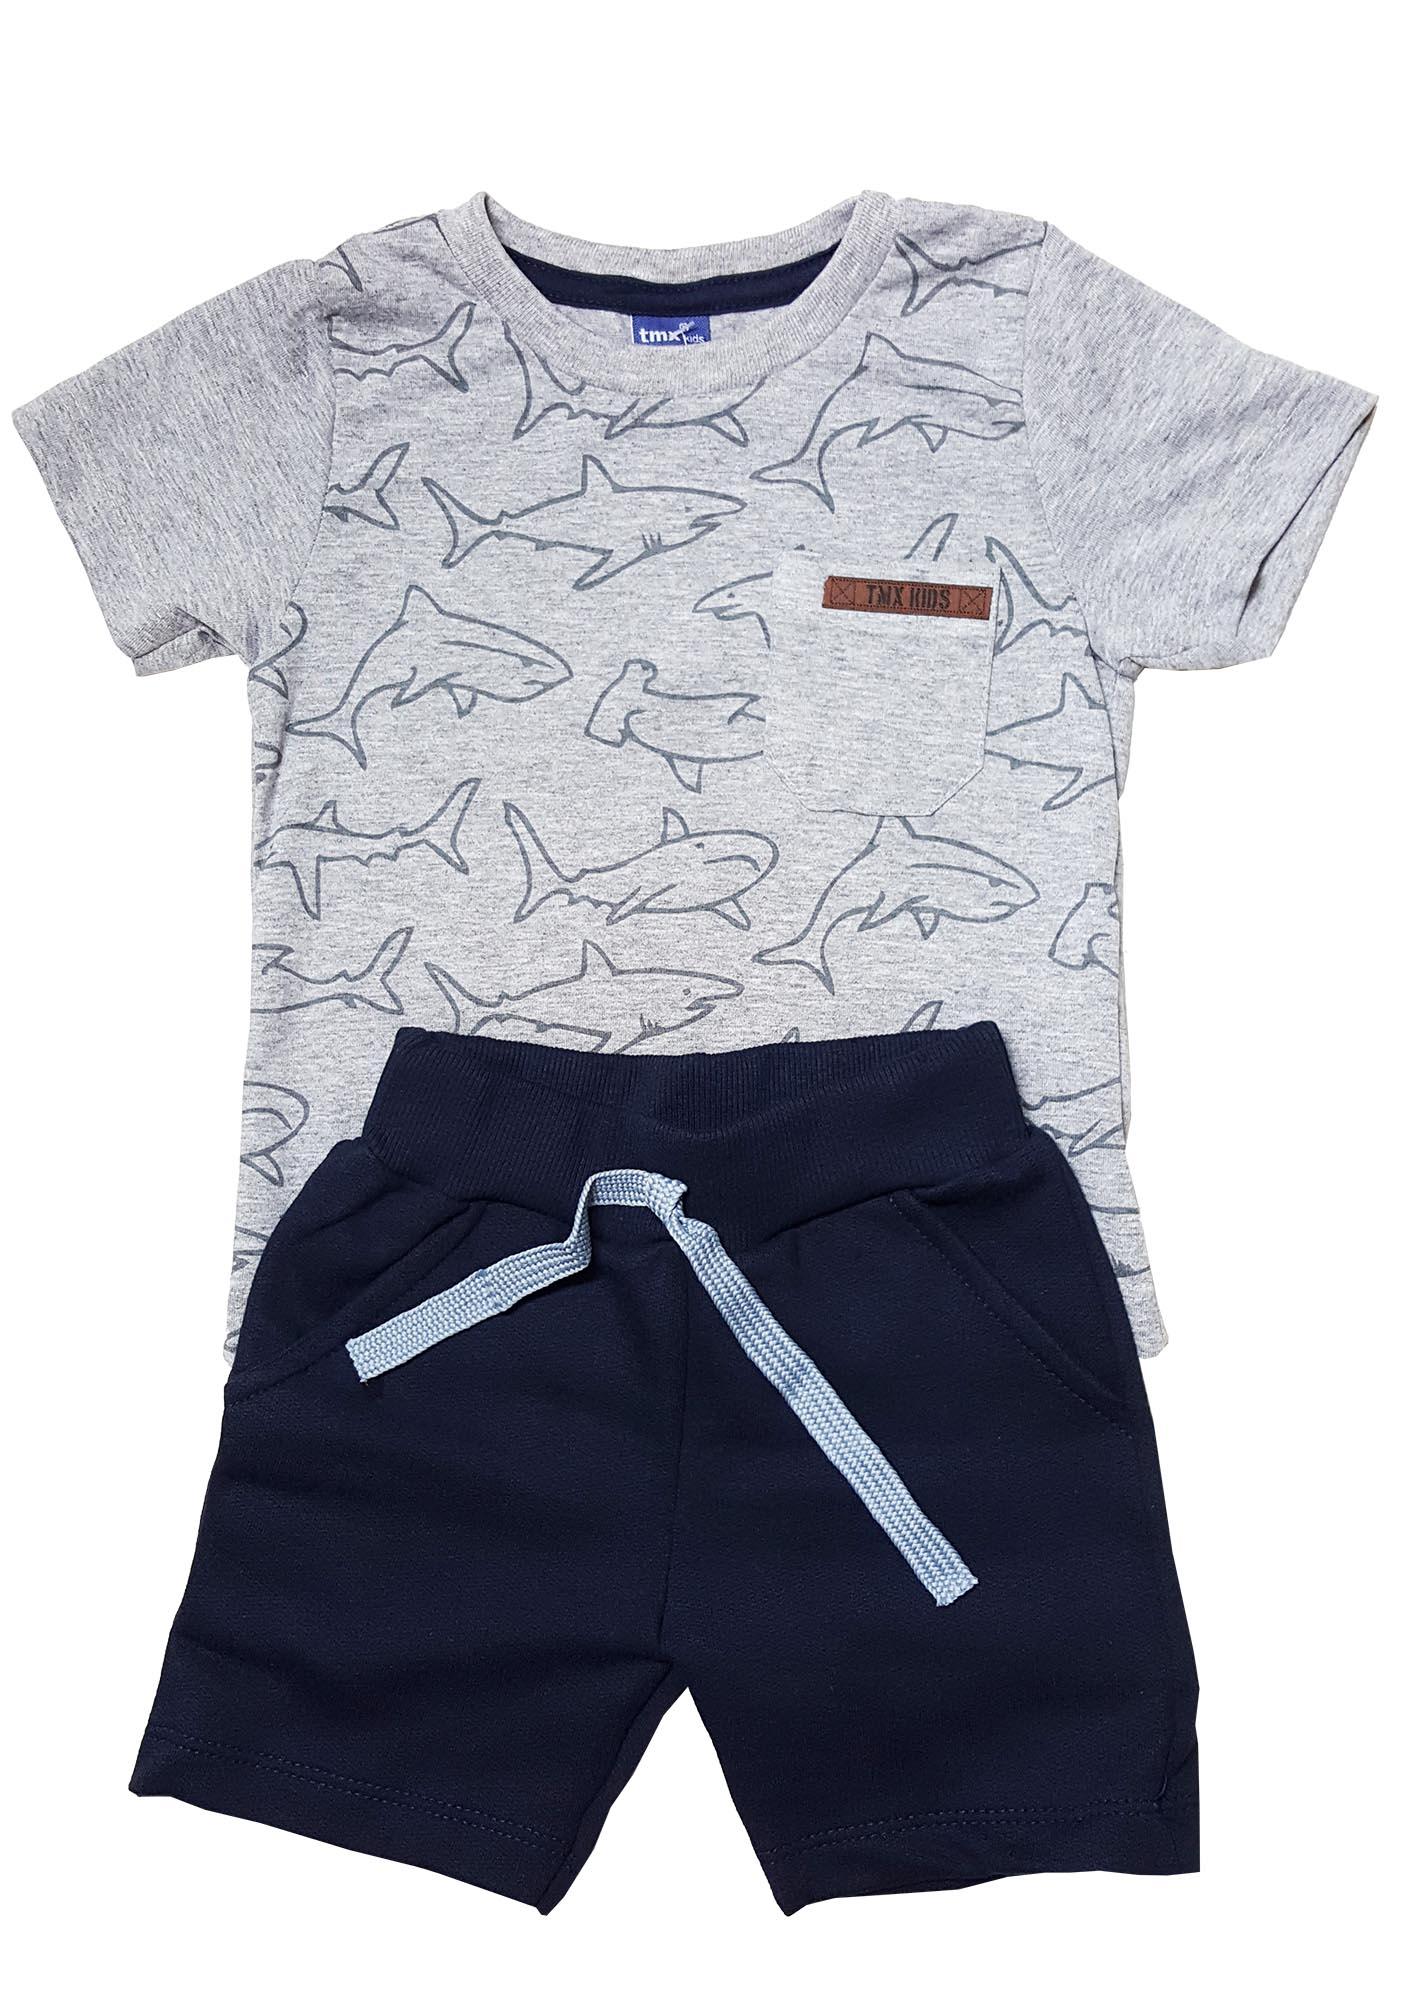 Conjunto Camiseta e Bermuda Moletom  TMX  Shark Mescla / Tamanho 1